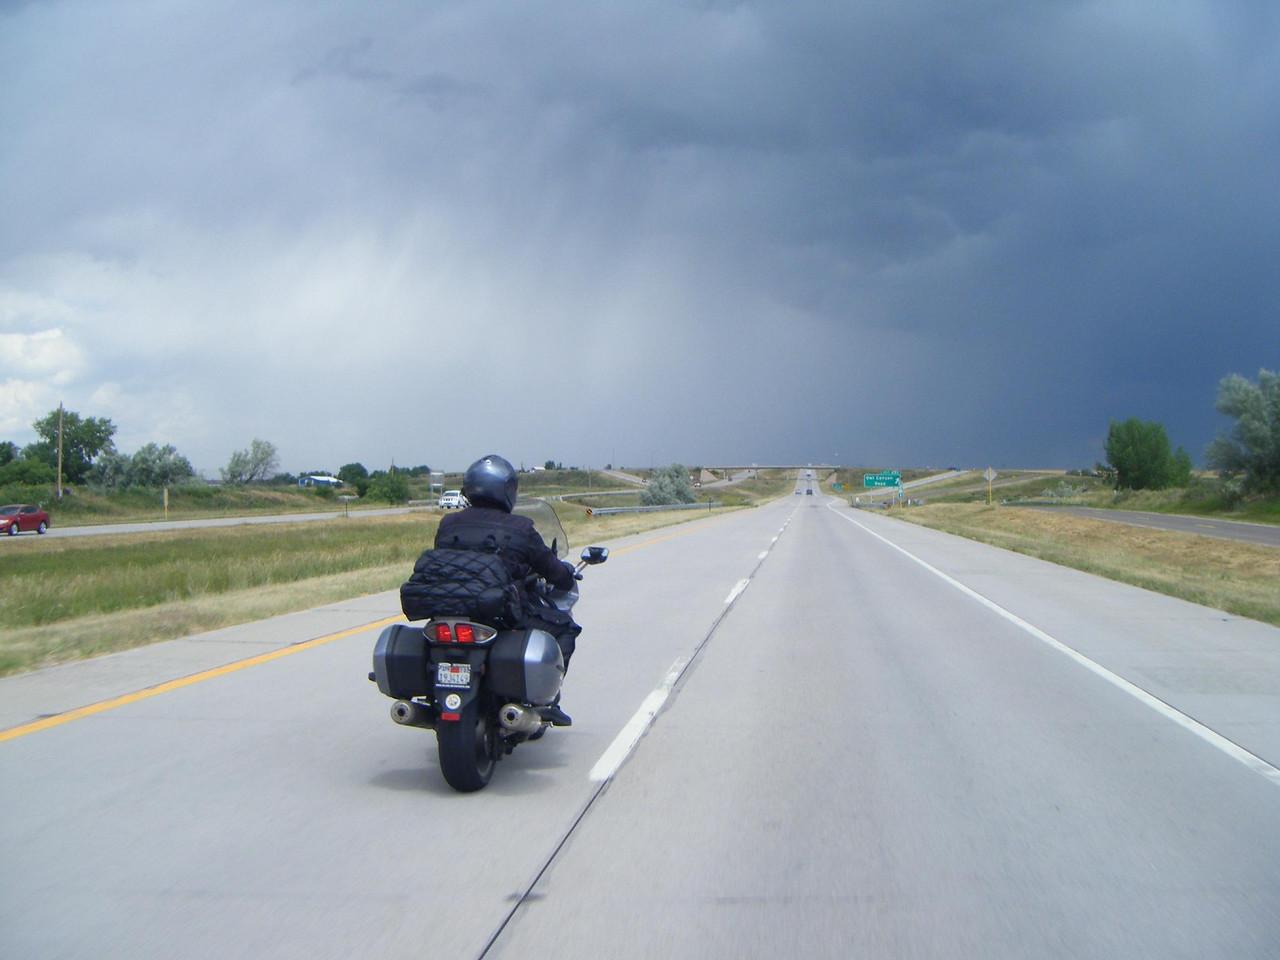 storm riding ahead